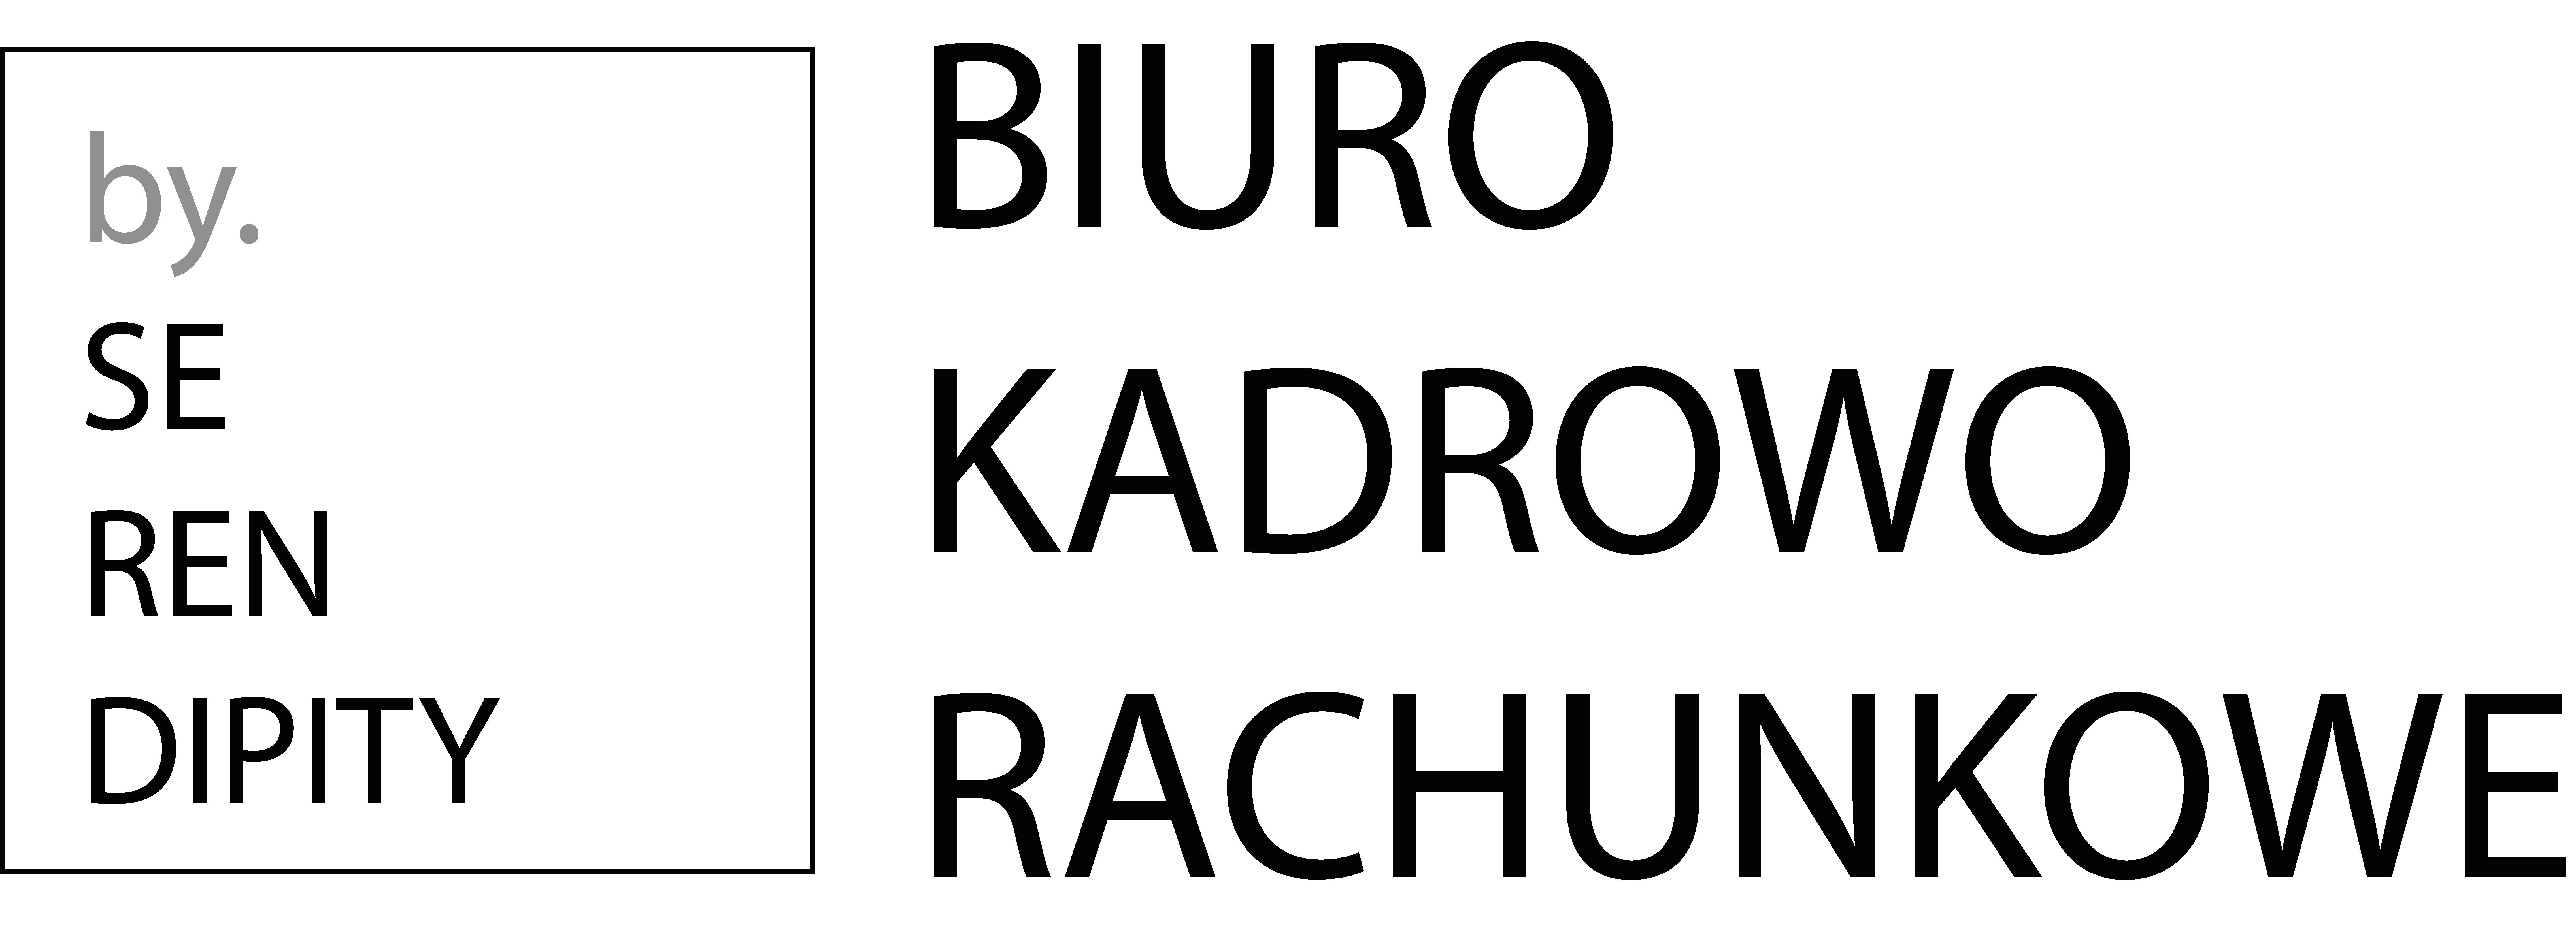 Biuro Kadrowo-Rachunkowe by.SERENDIPITY